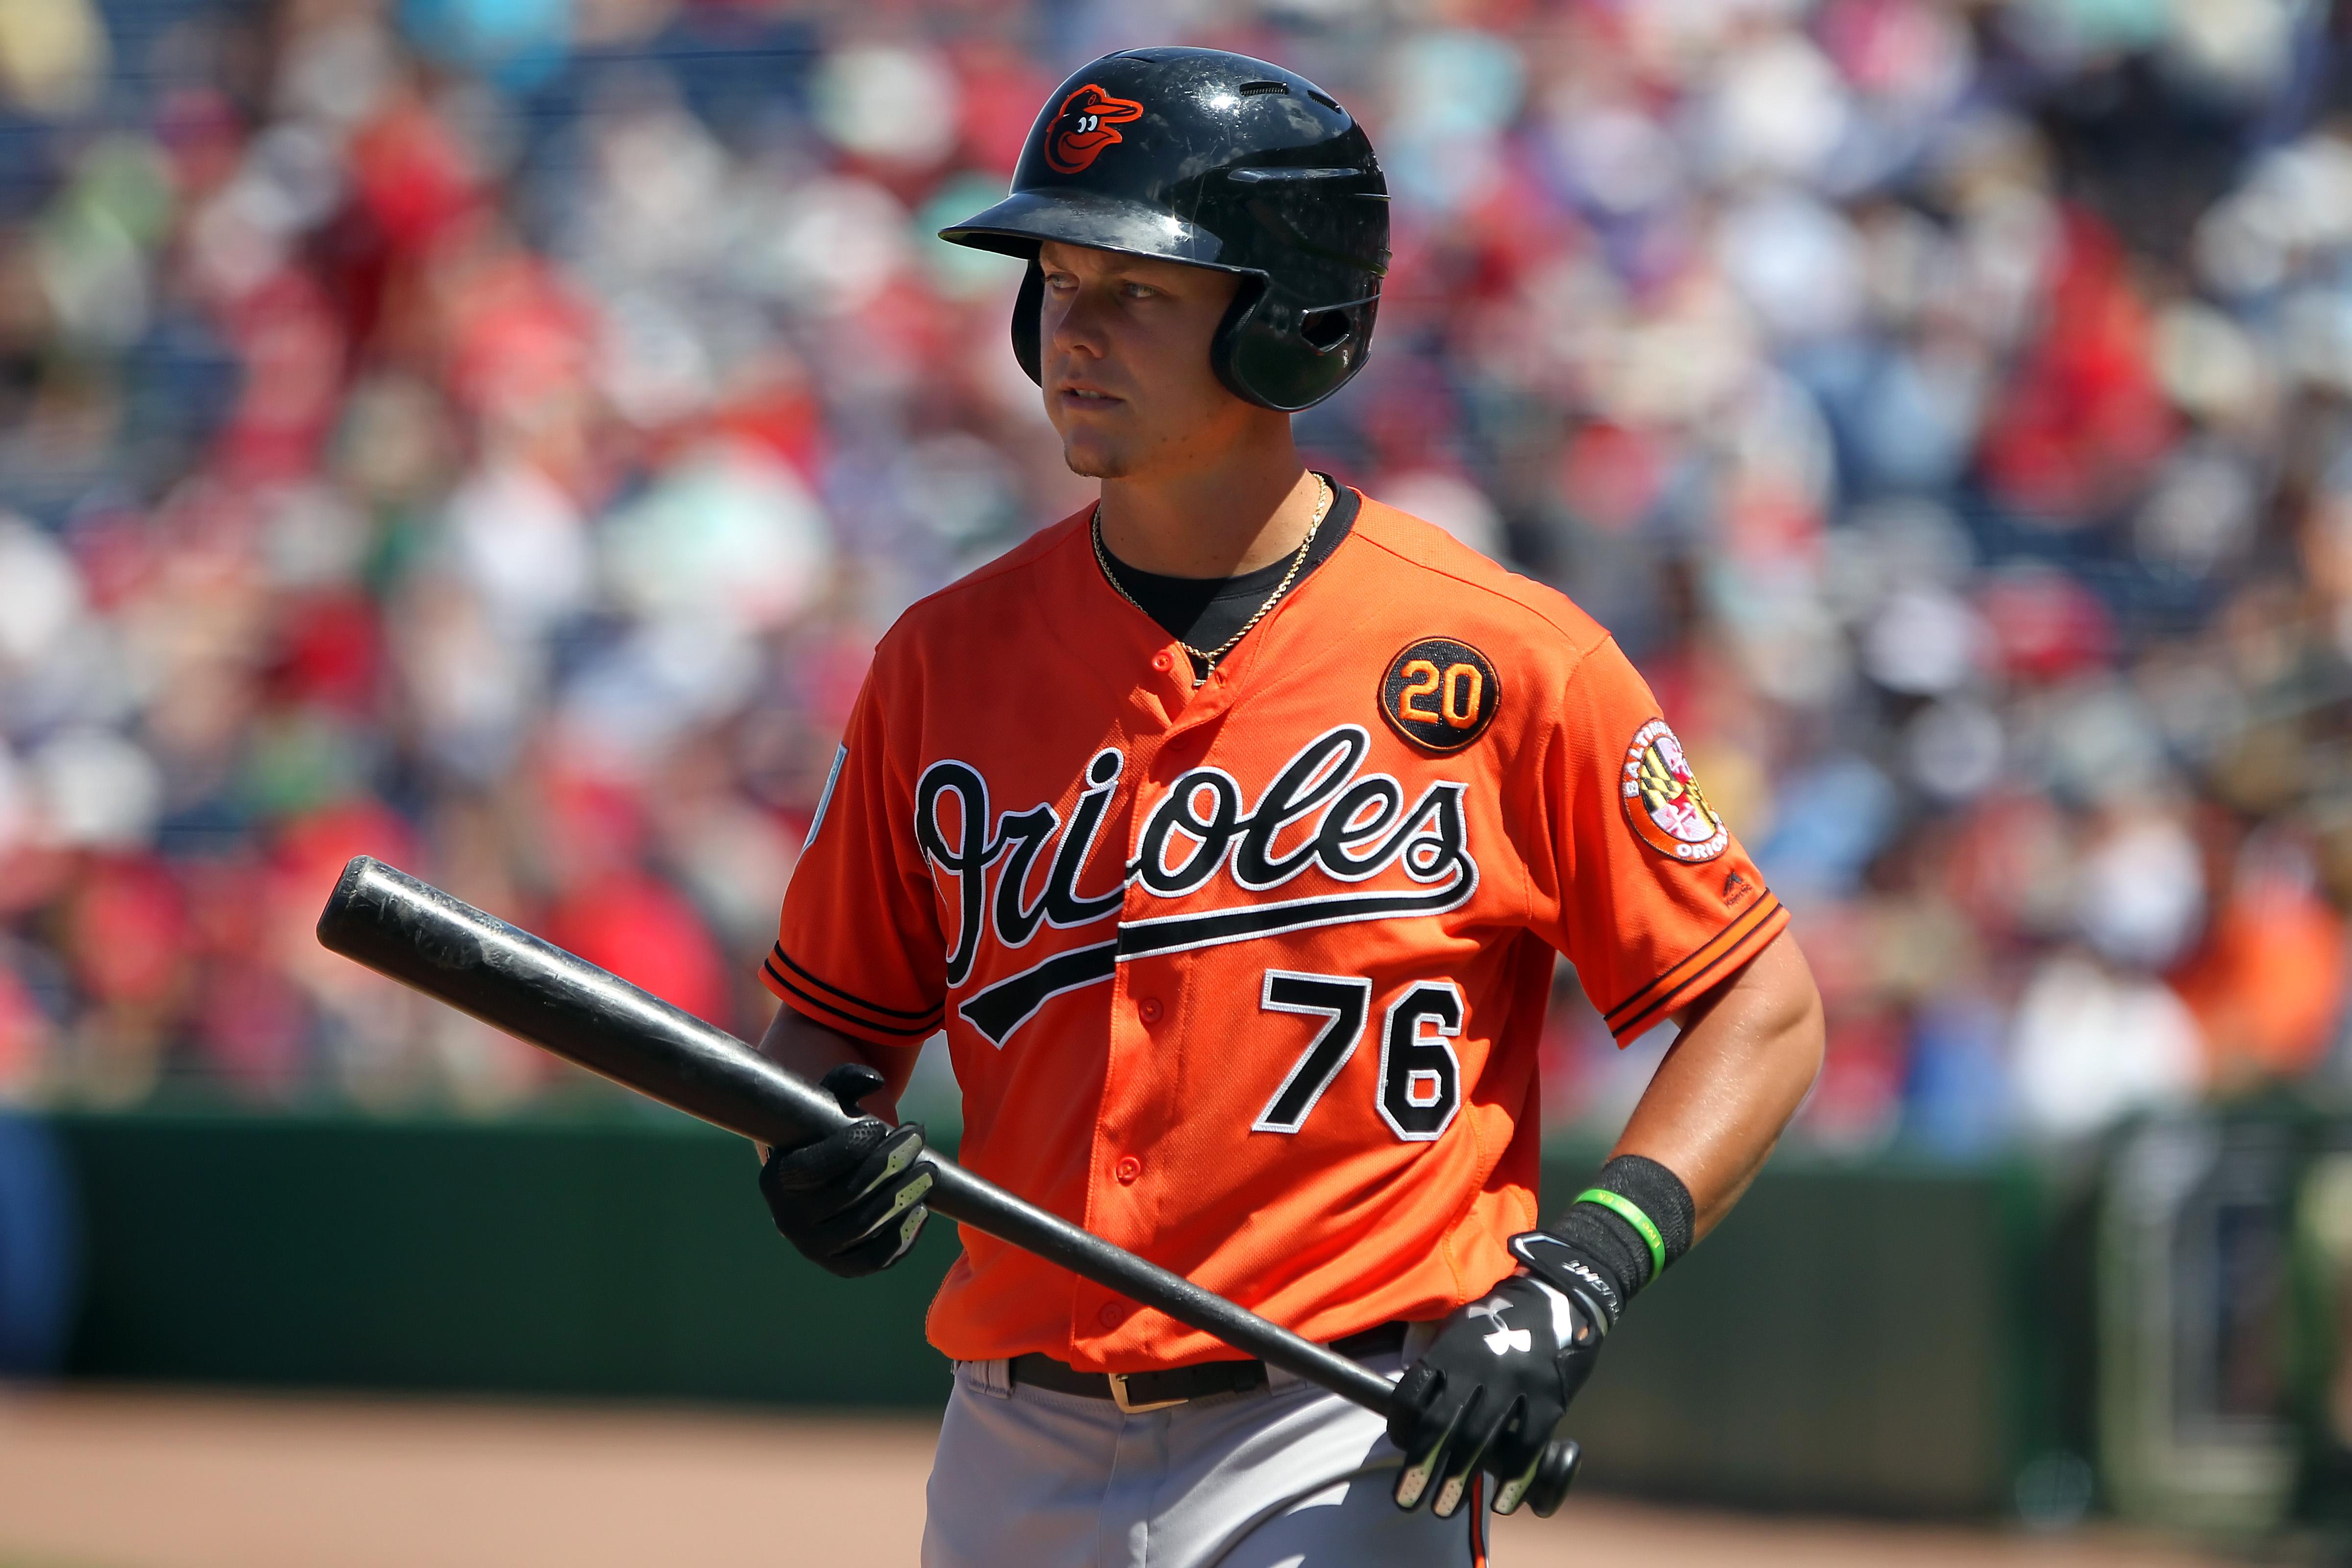 MLB: MAR 24 Spring Training - Orioles at Phillies